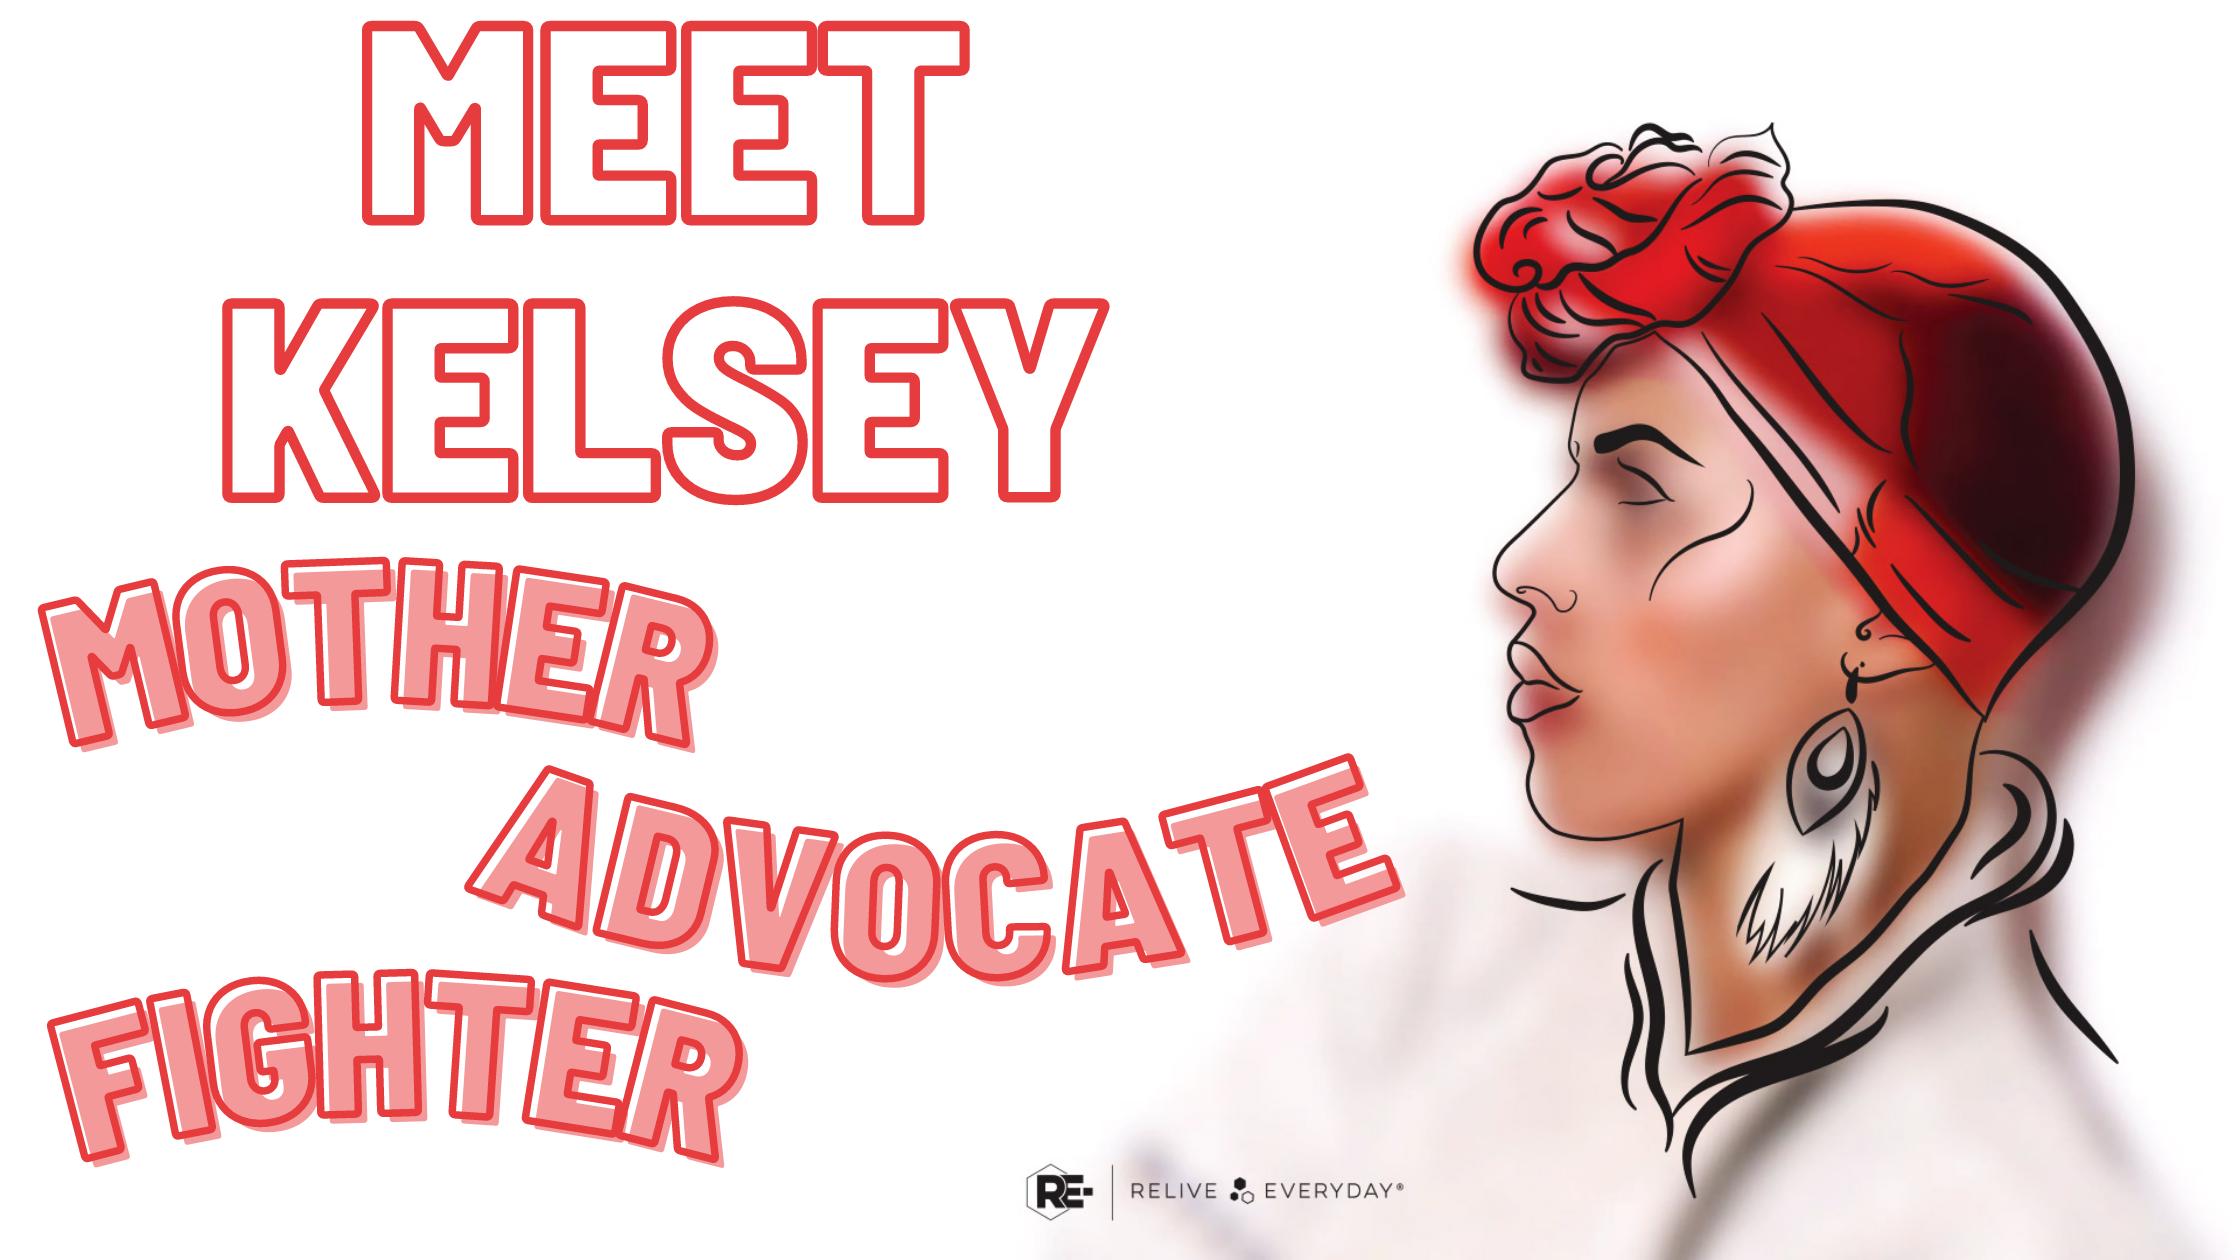 MEET KELSEY MOTHER. ADVOCATE. FIGHTER